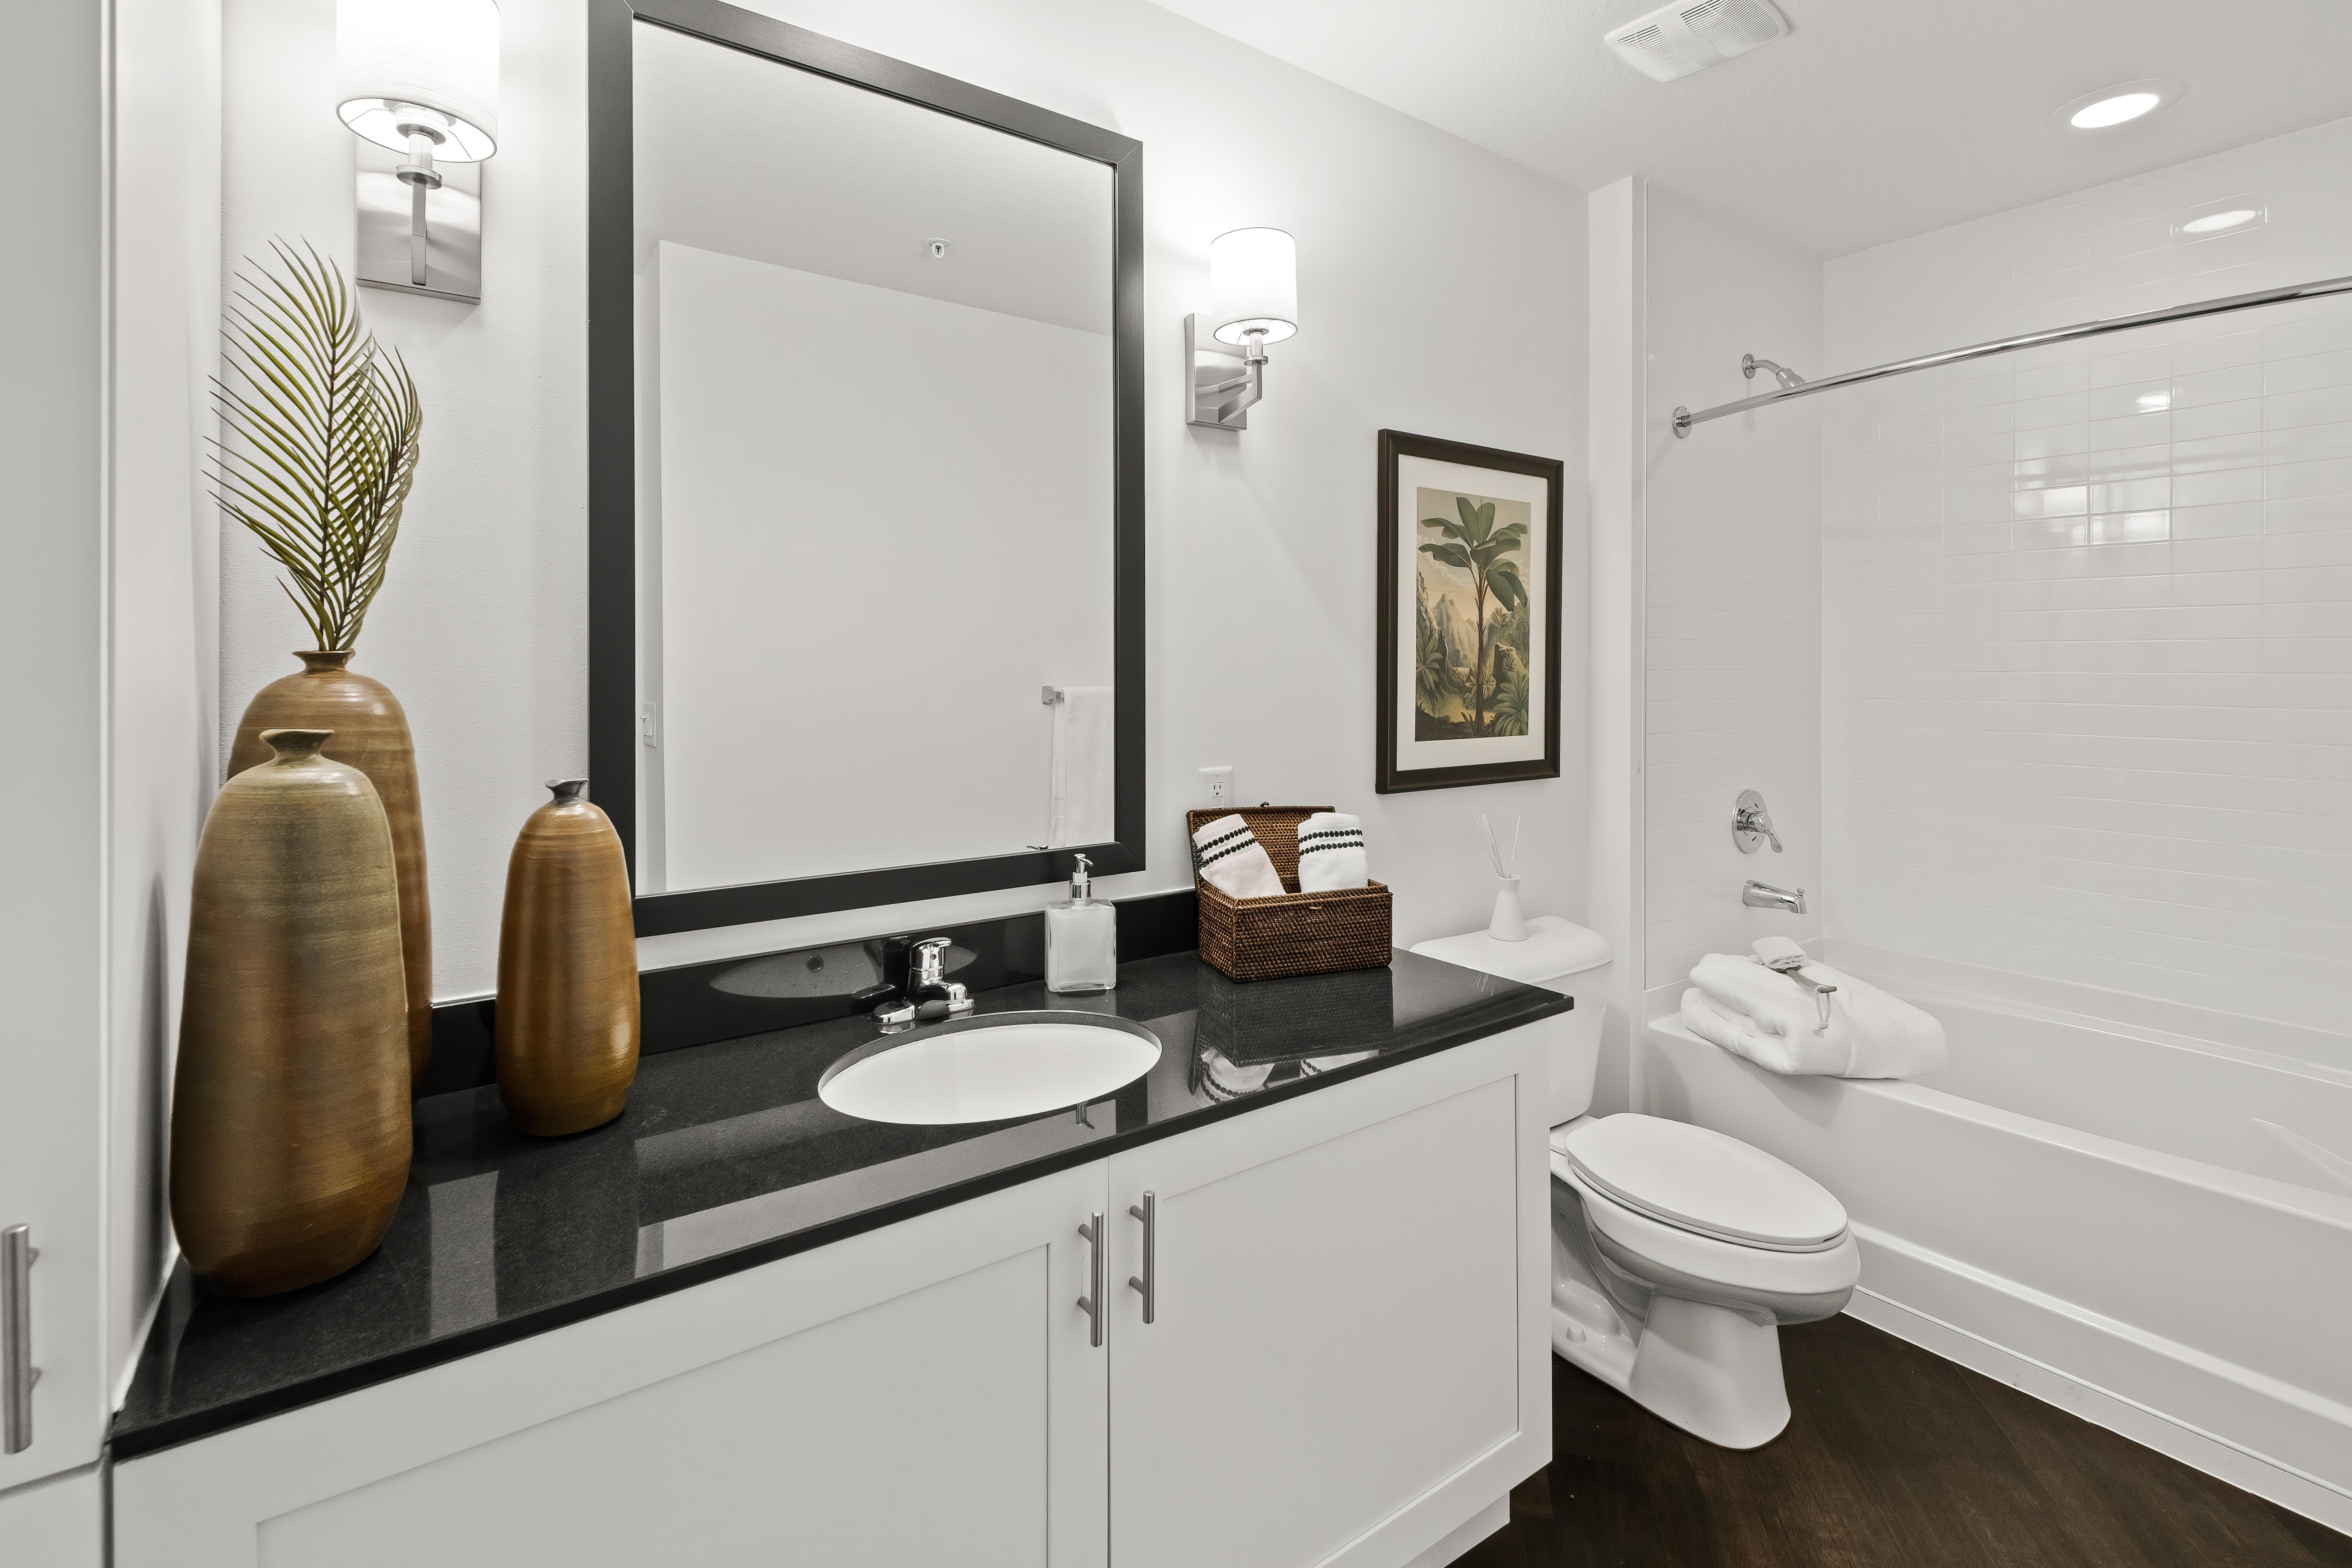 Well lit bathroom with oversize vanity at Town Lantana in Lantana, Florida